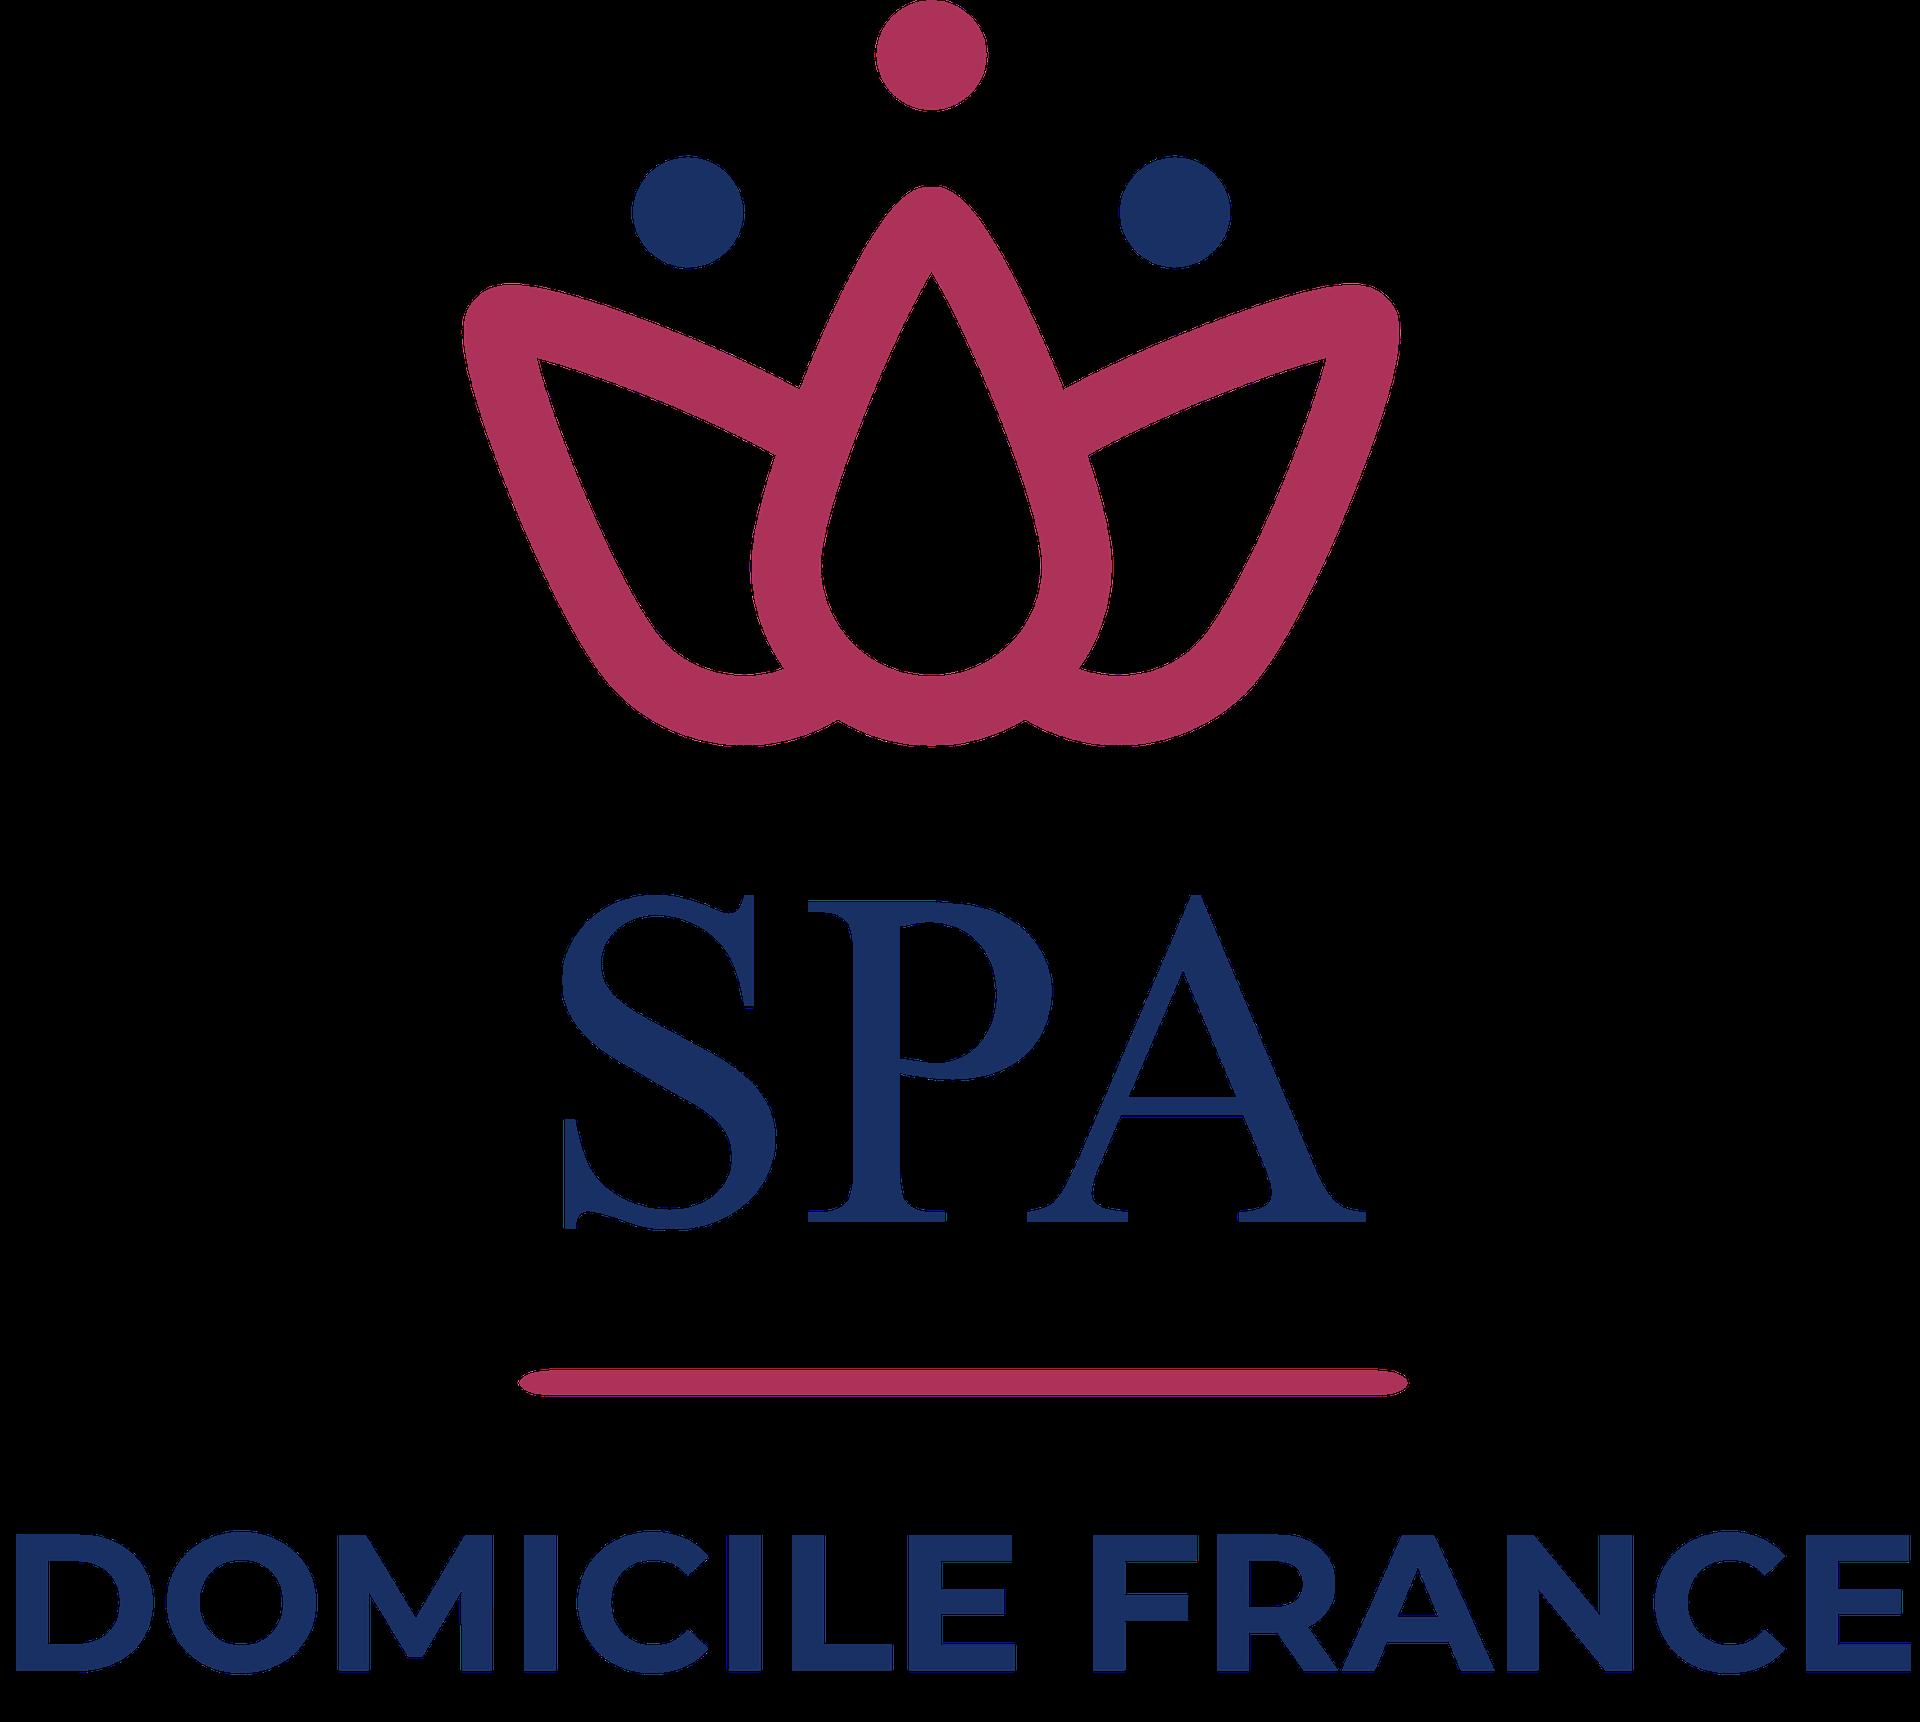 Spa Domicile France